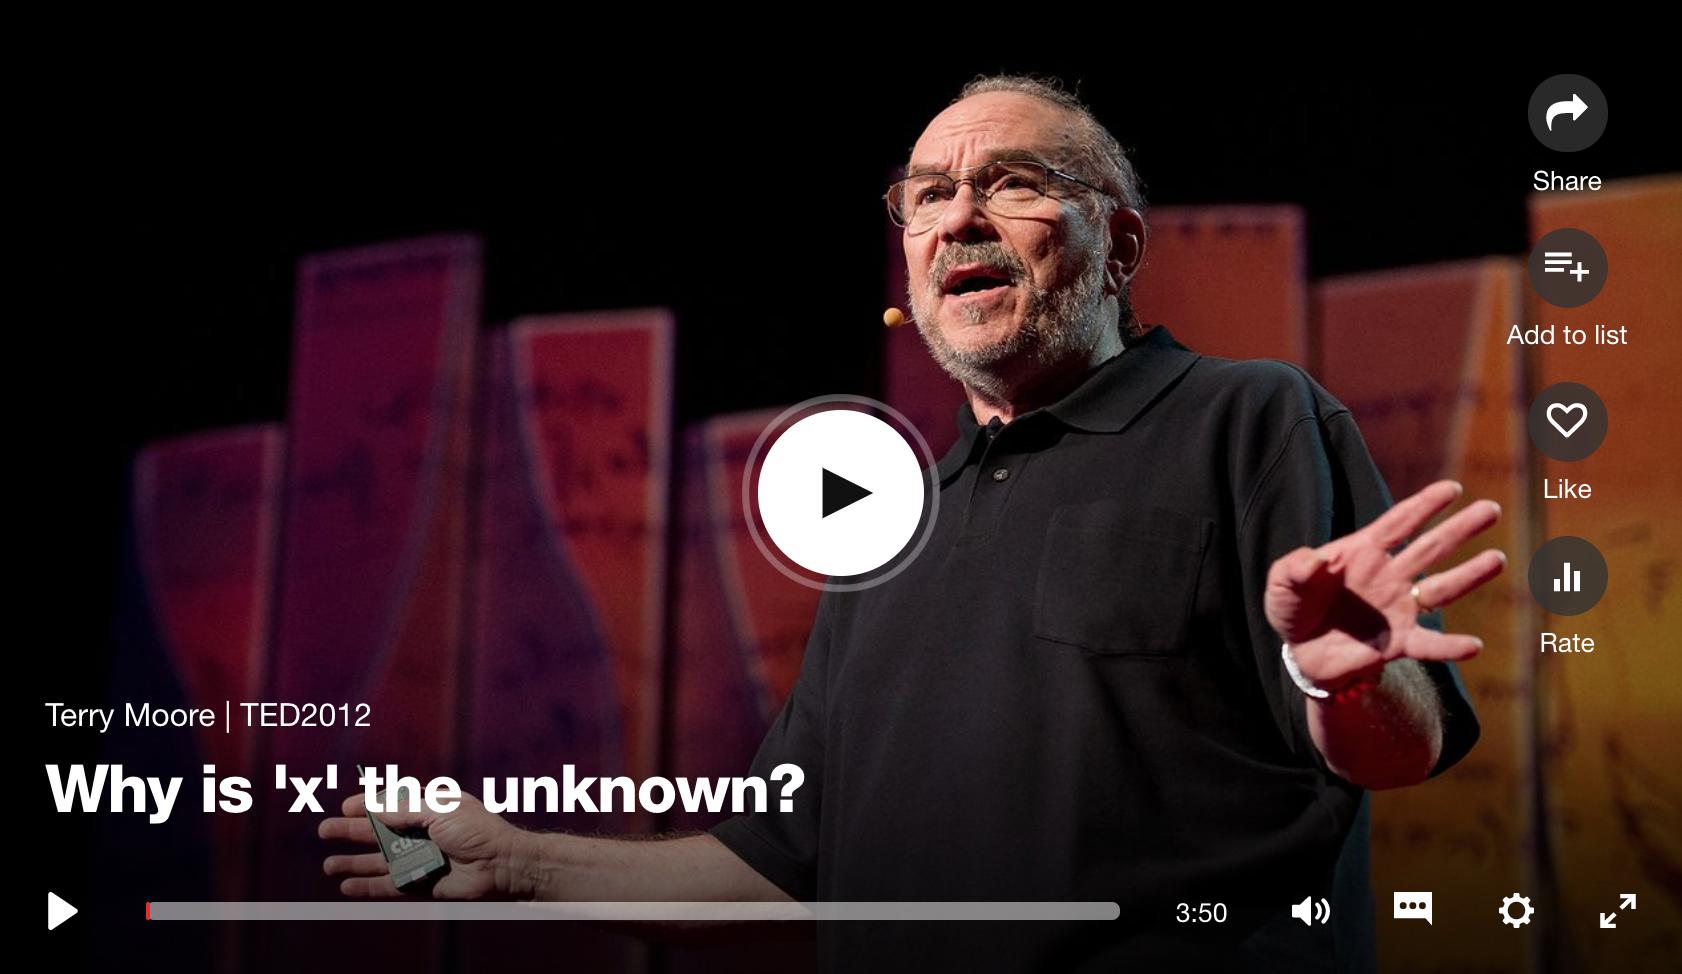 TED TALK「なぜ 'X' は未知を表すのか?」